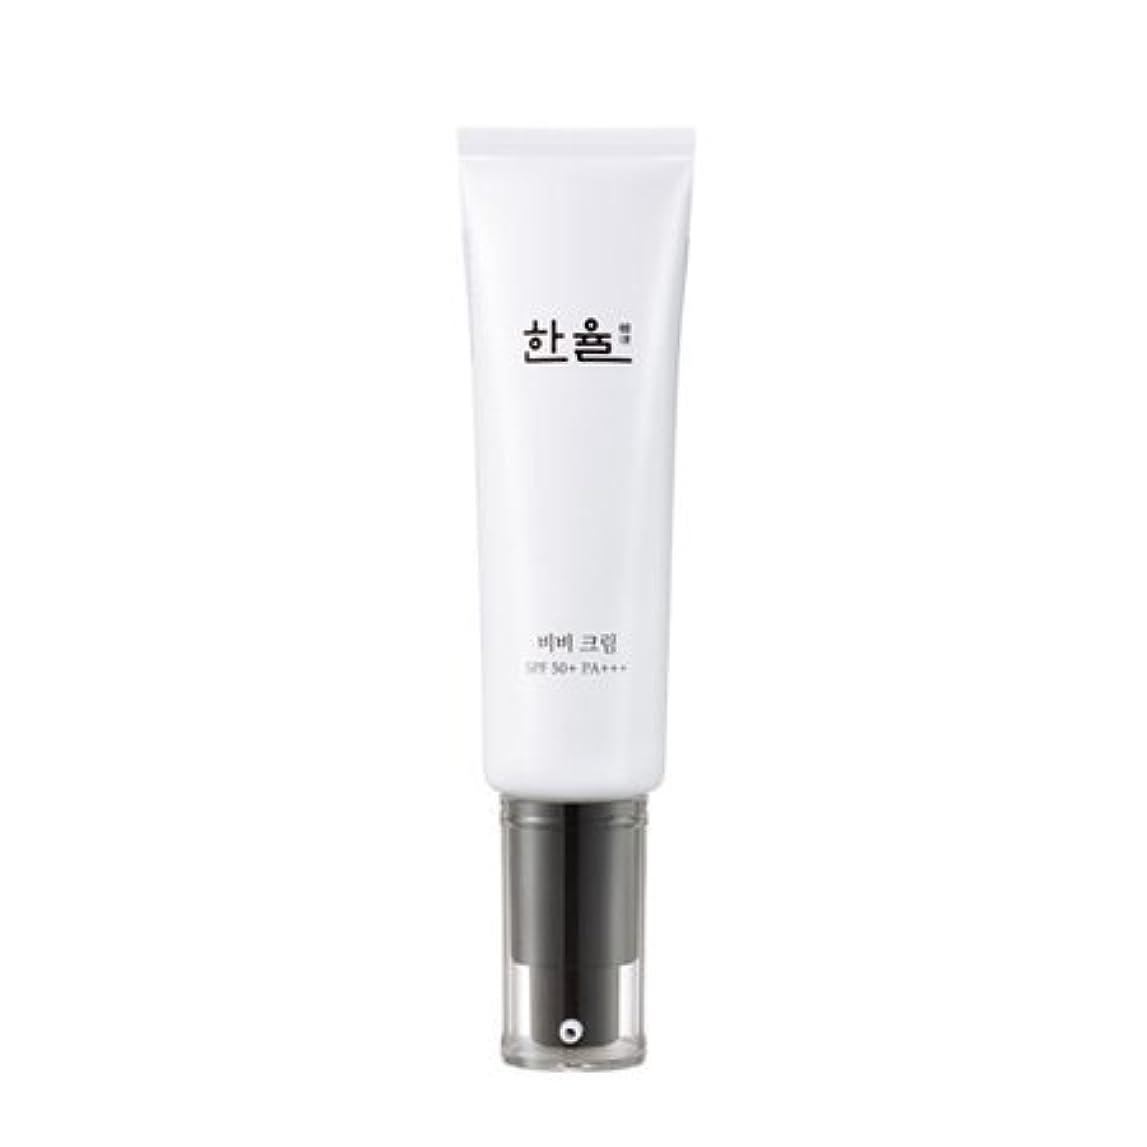 [HANYUL] BB Cream SPF 50+/pa+++ (#02 Soft Beige)